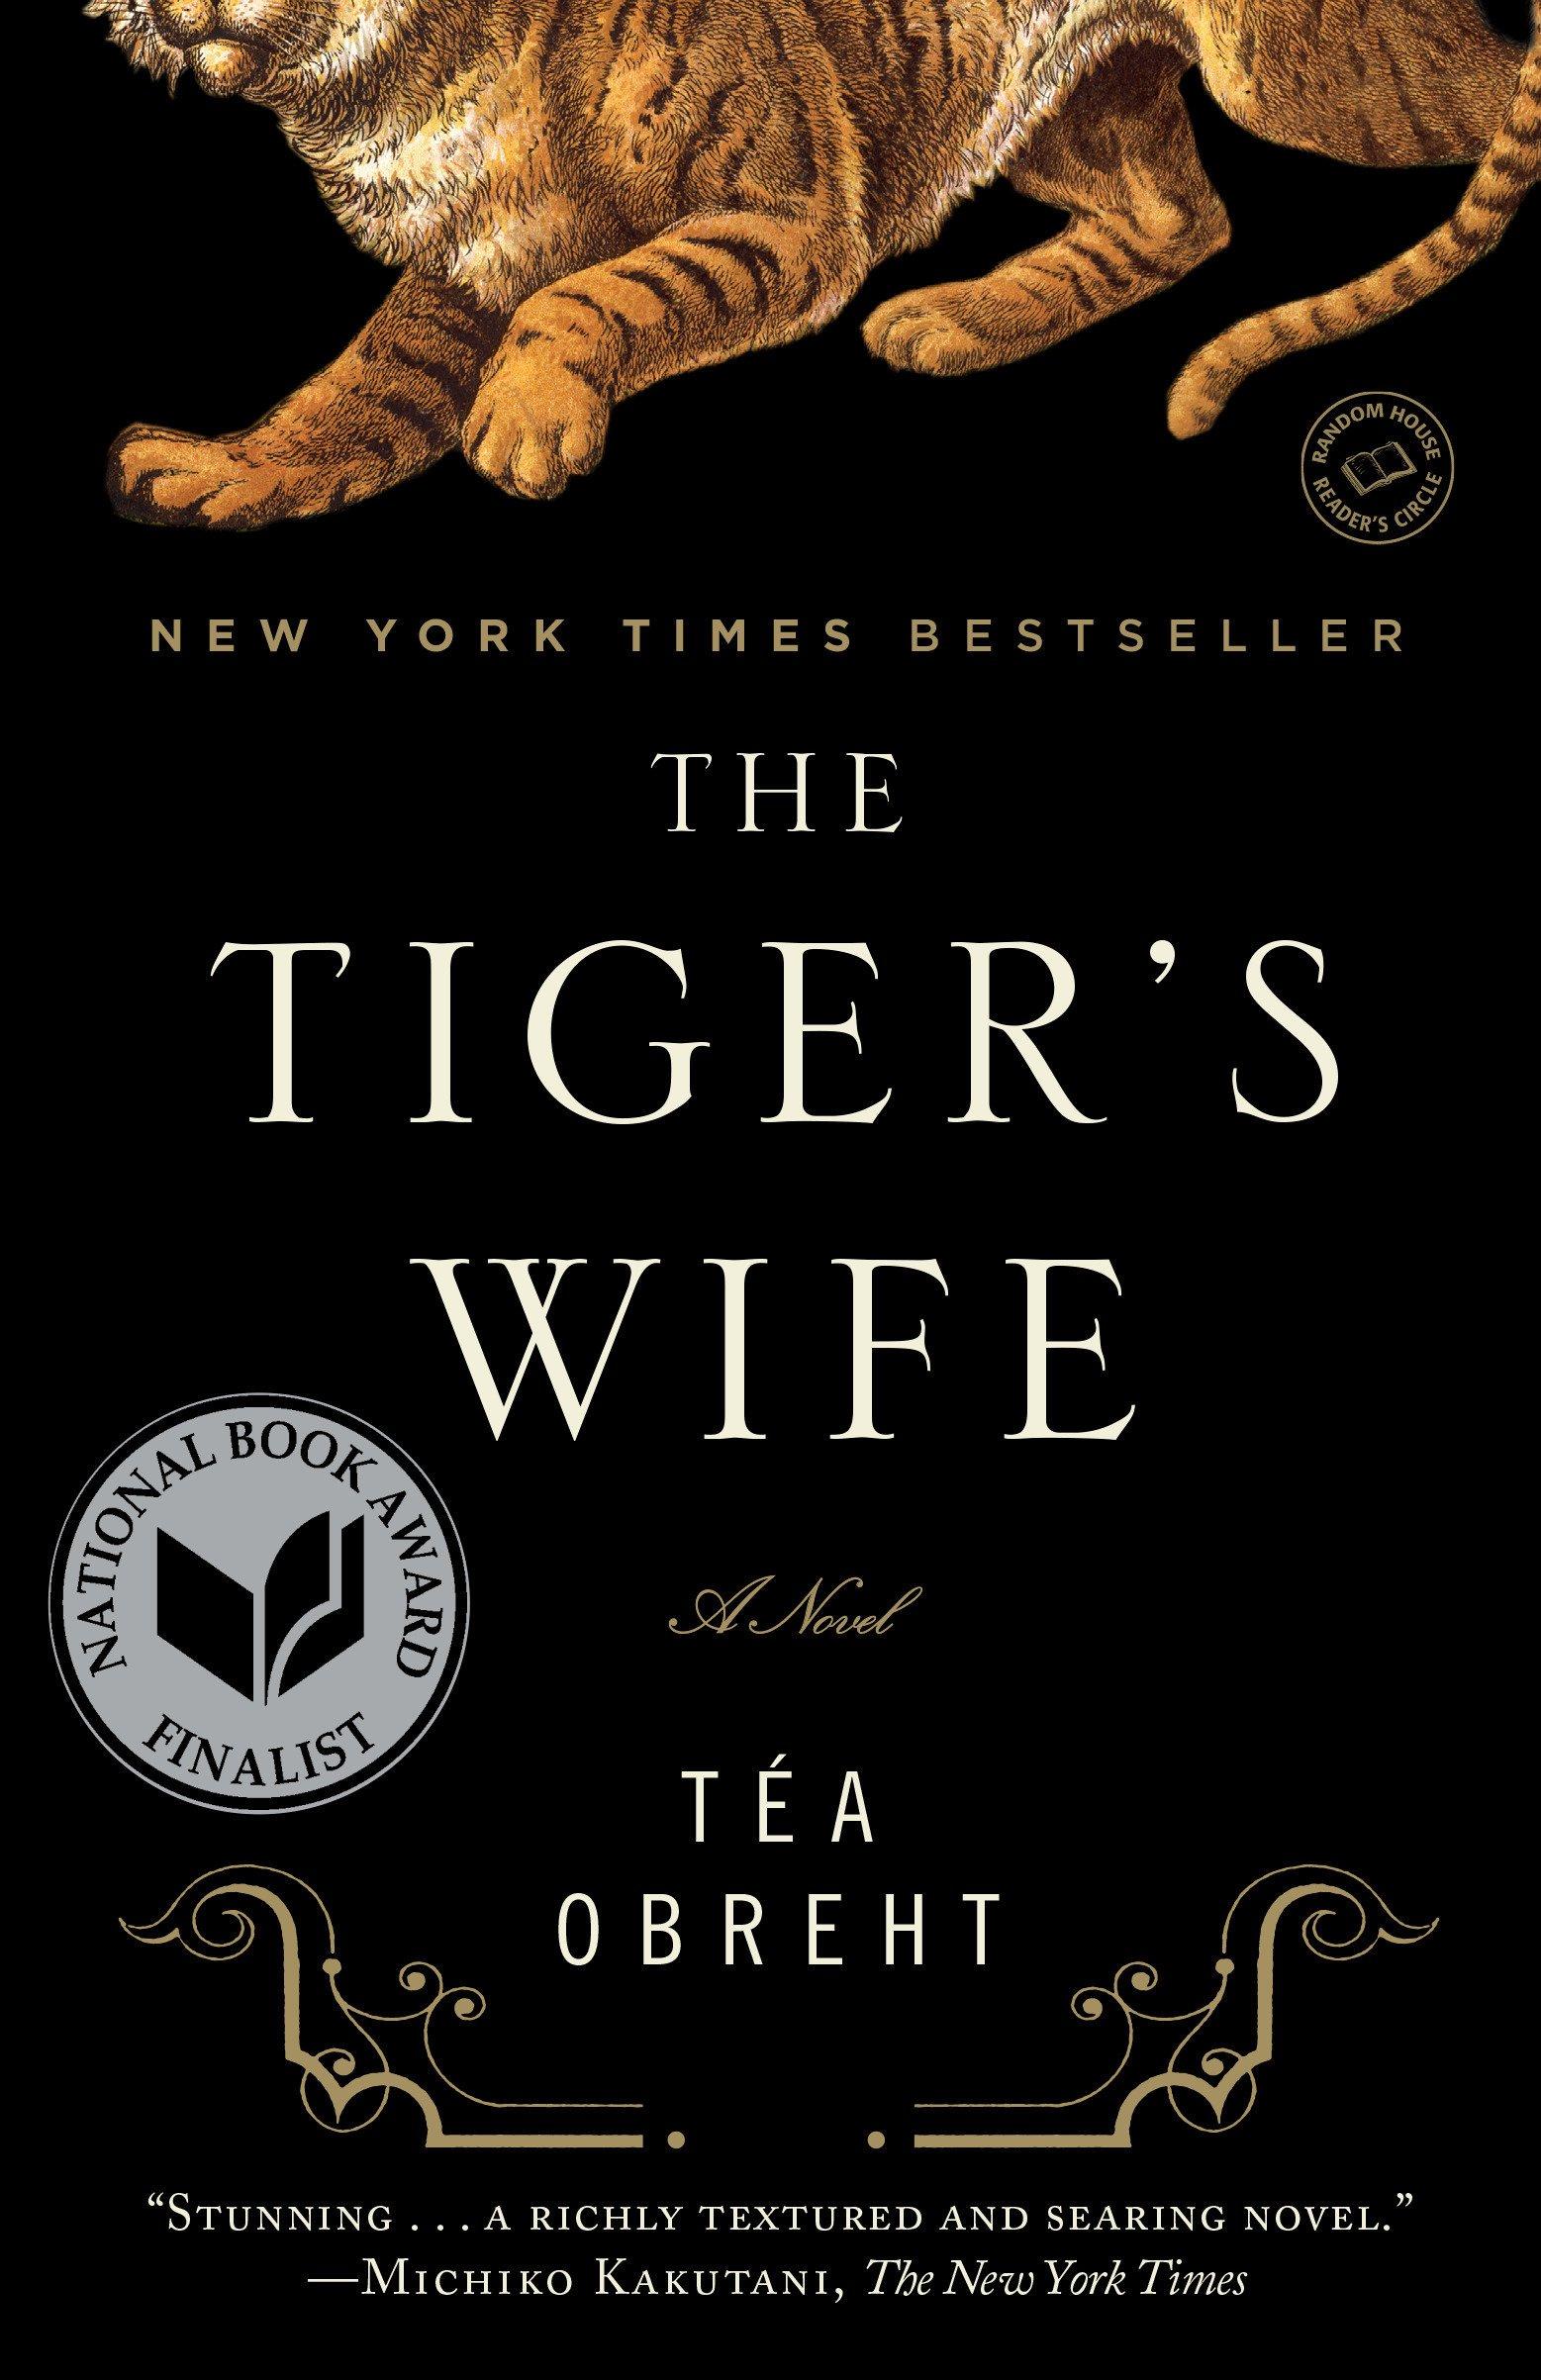 Téa Obreht, The Tiger's Wife